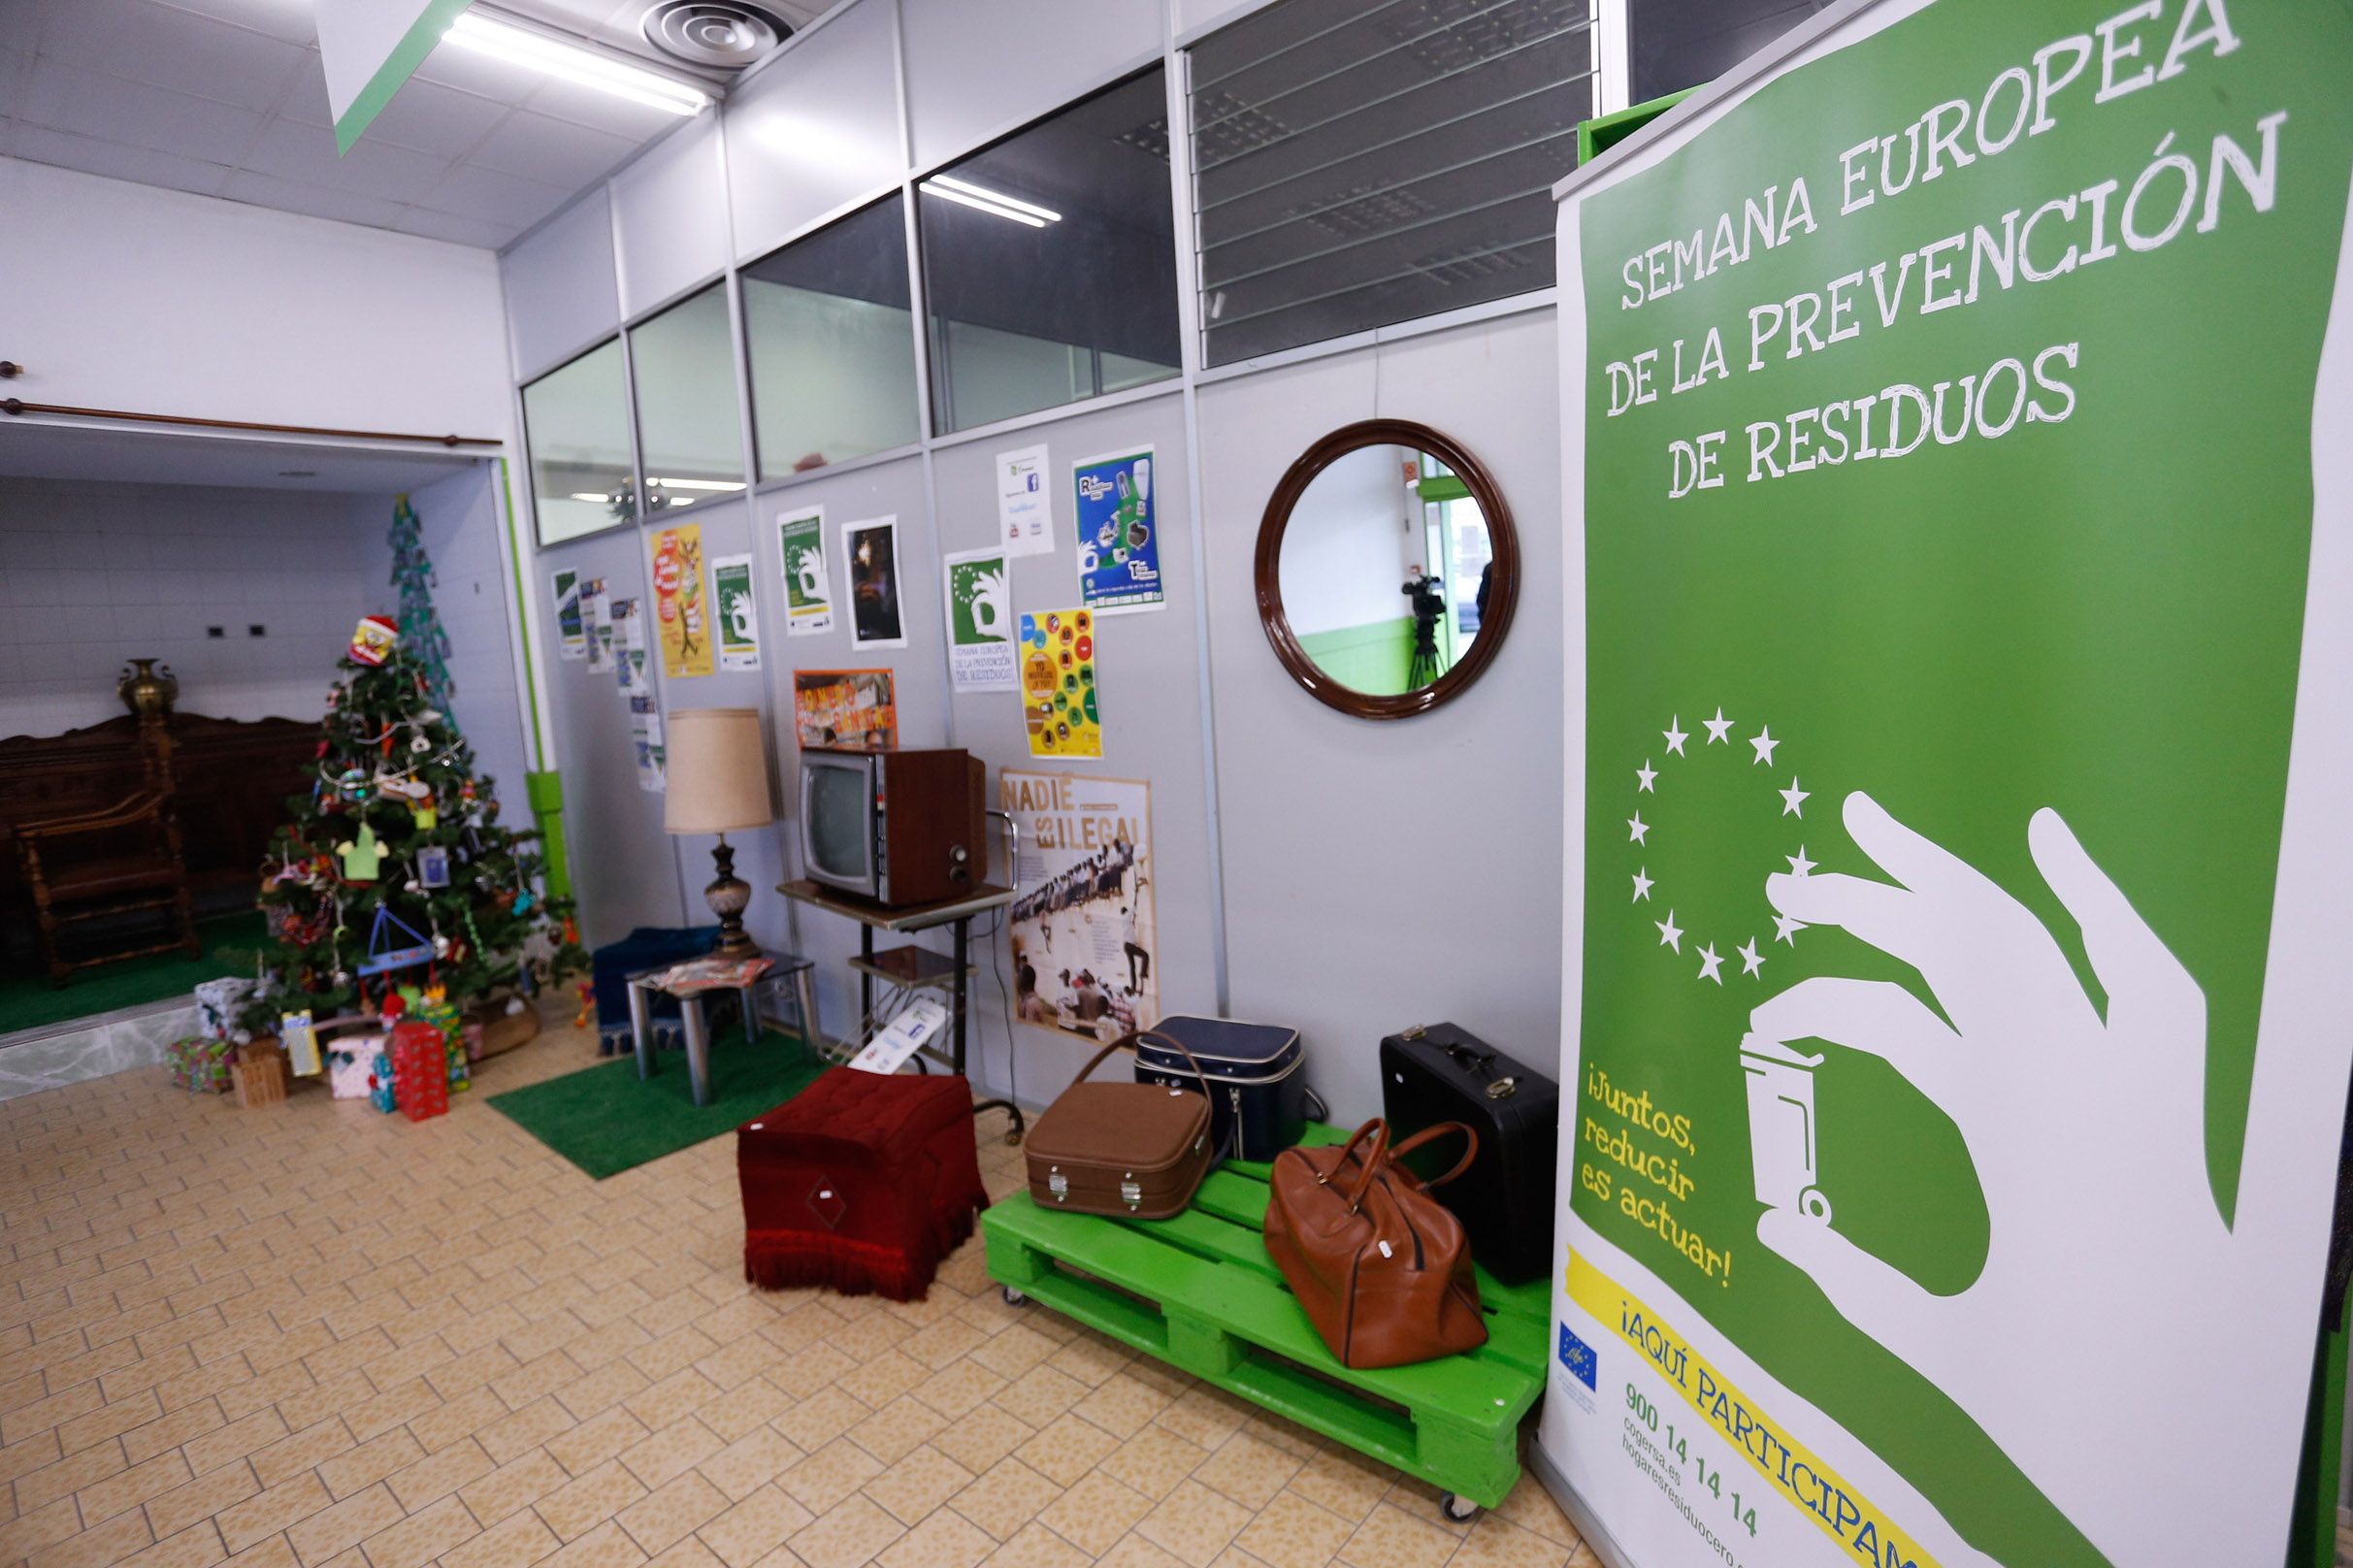 Se Recogen 8 300 Kilos De Cachivaches Para La Fundaci N Social  # Muebles Reto Asturias